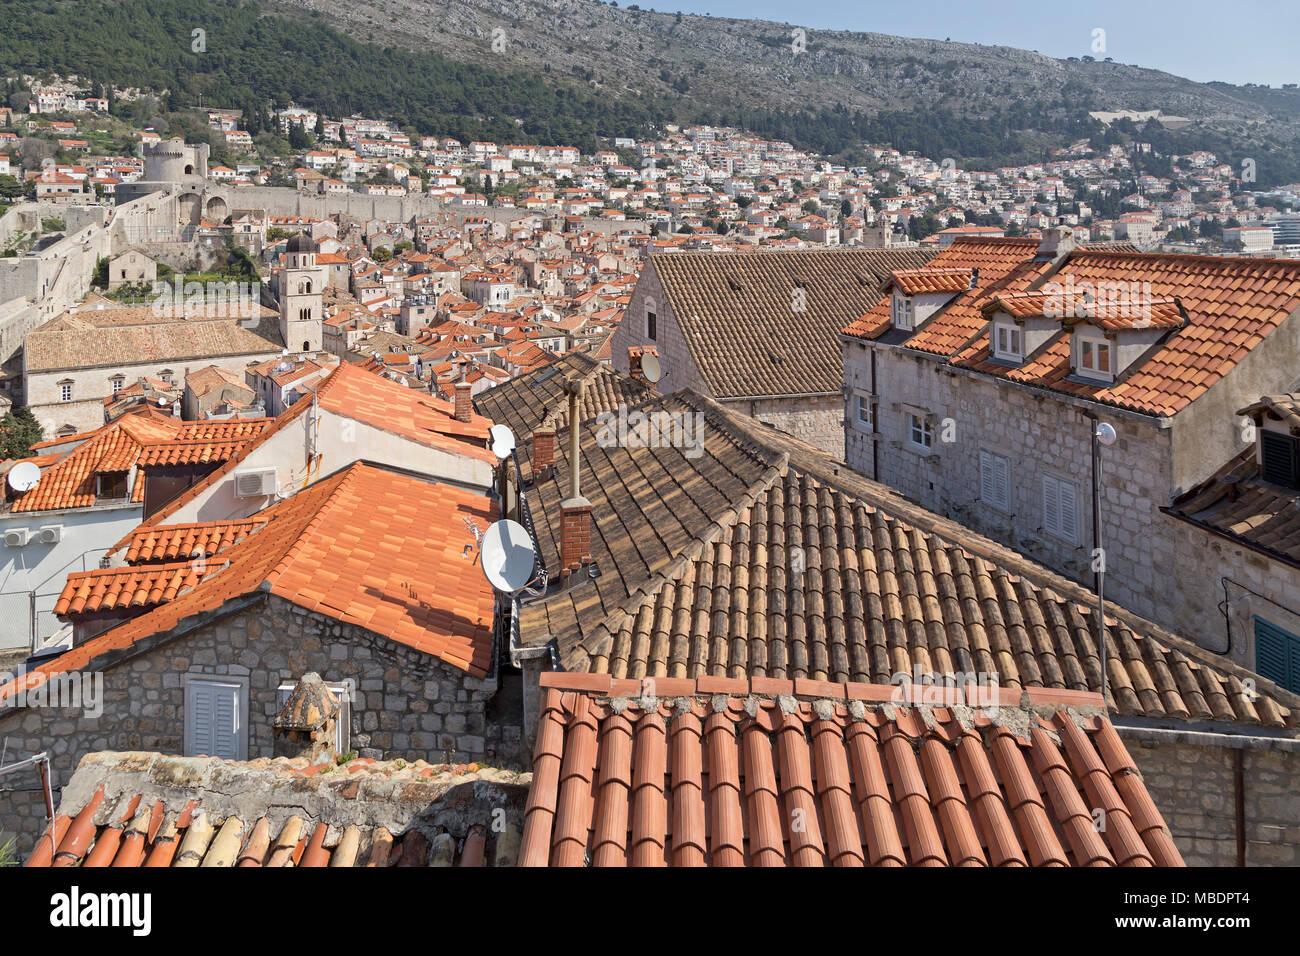 old town, Dubrovnik, Croatia Stock Photo